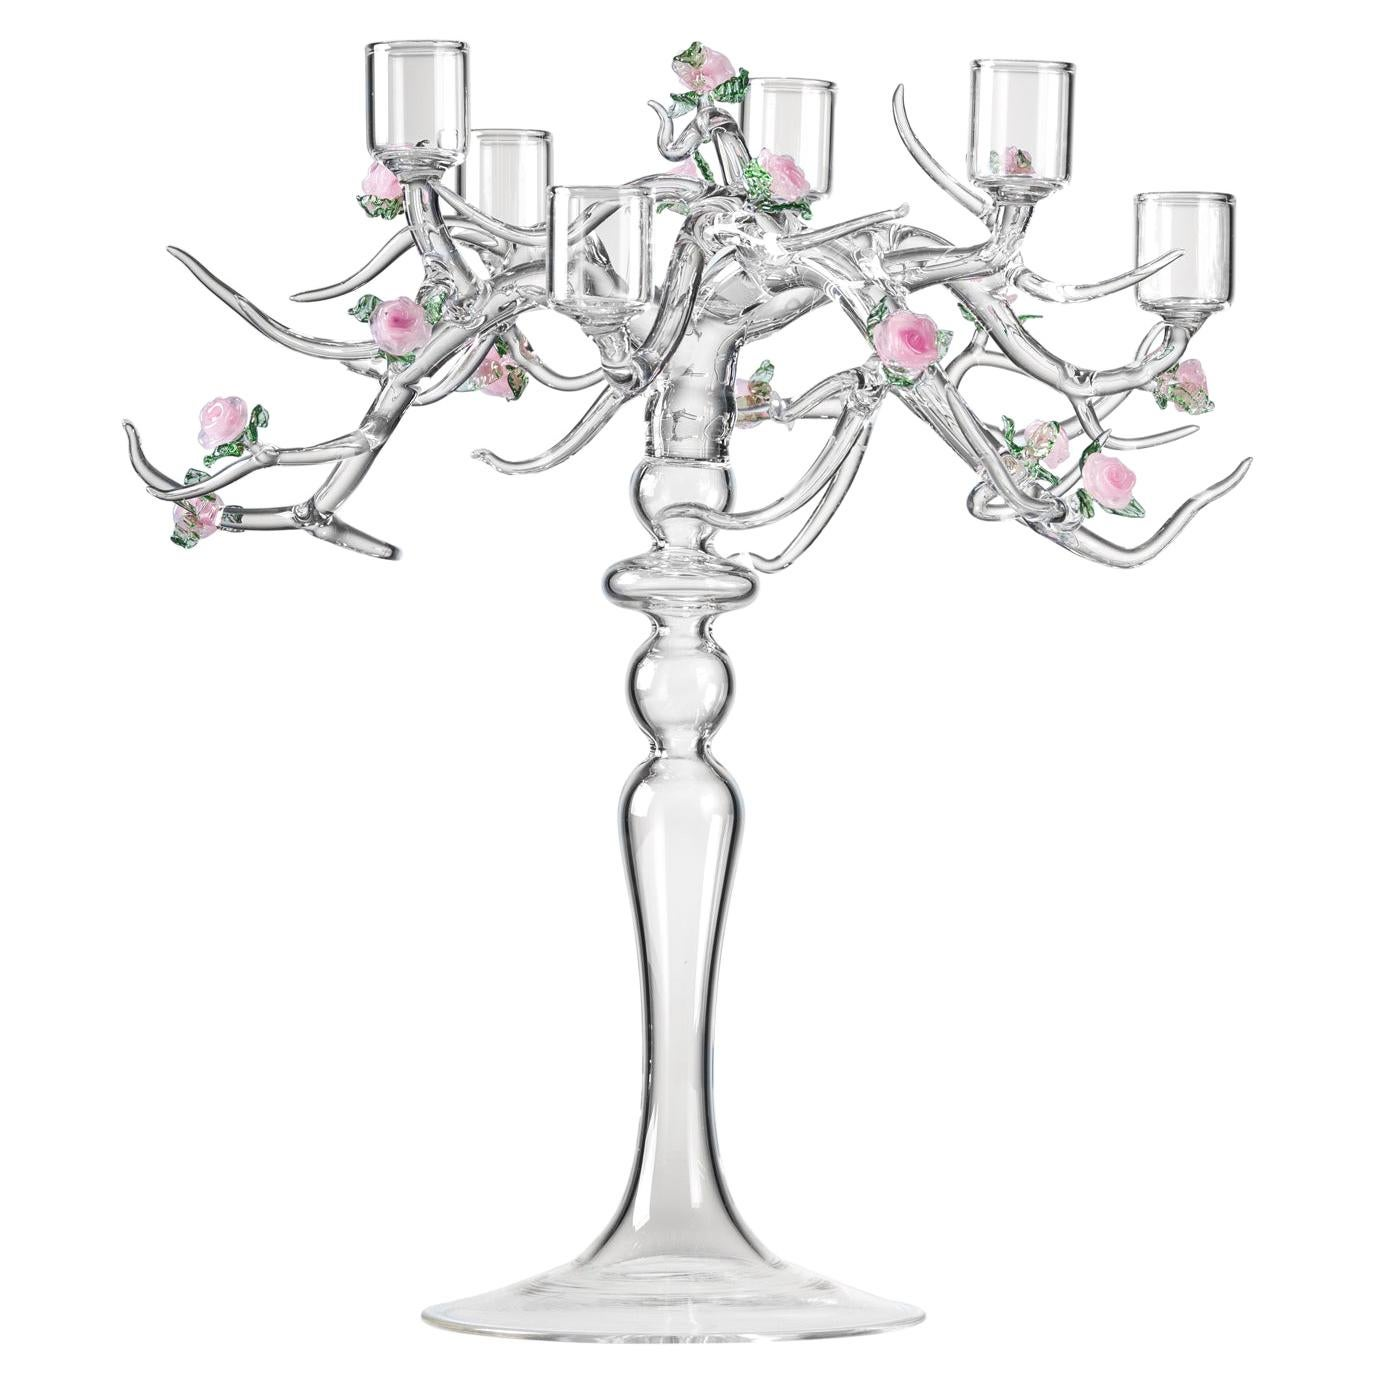 Rose Candelabra Handmade Glass Candelabra by Simone Crestani